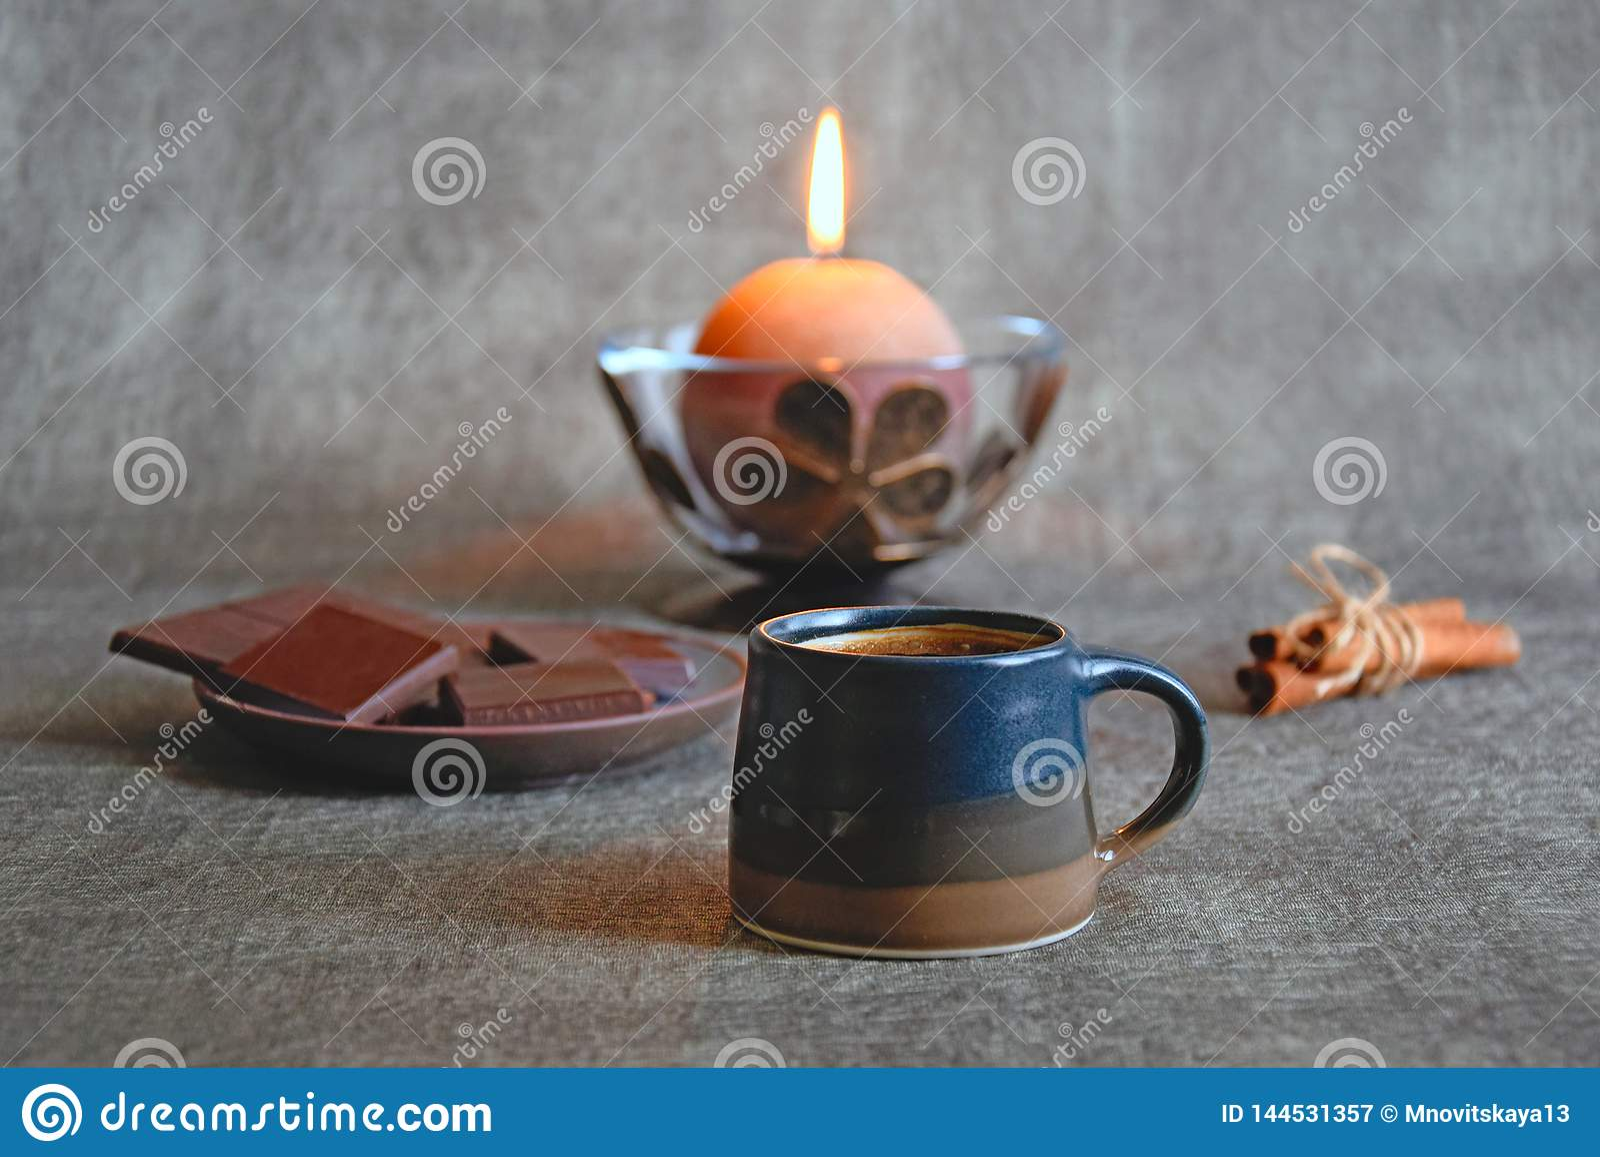 Cup of coffee, dark chocolate, cinnamon sticks and burning decorative candle